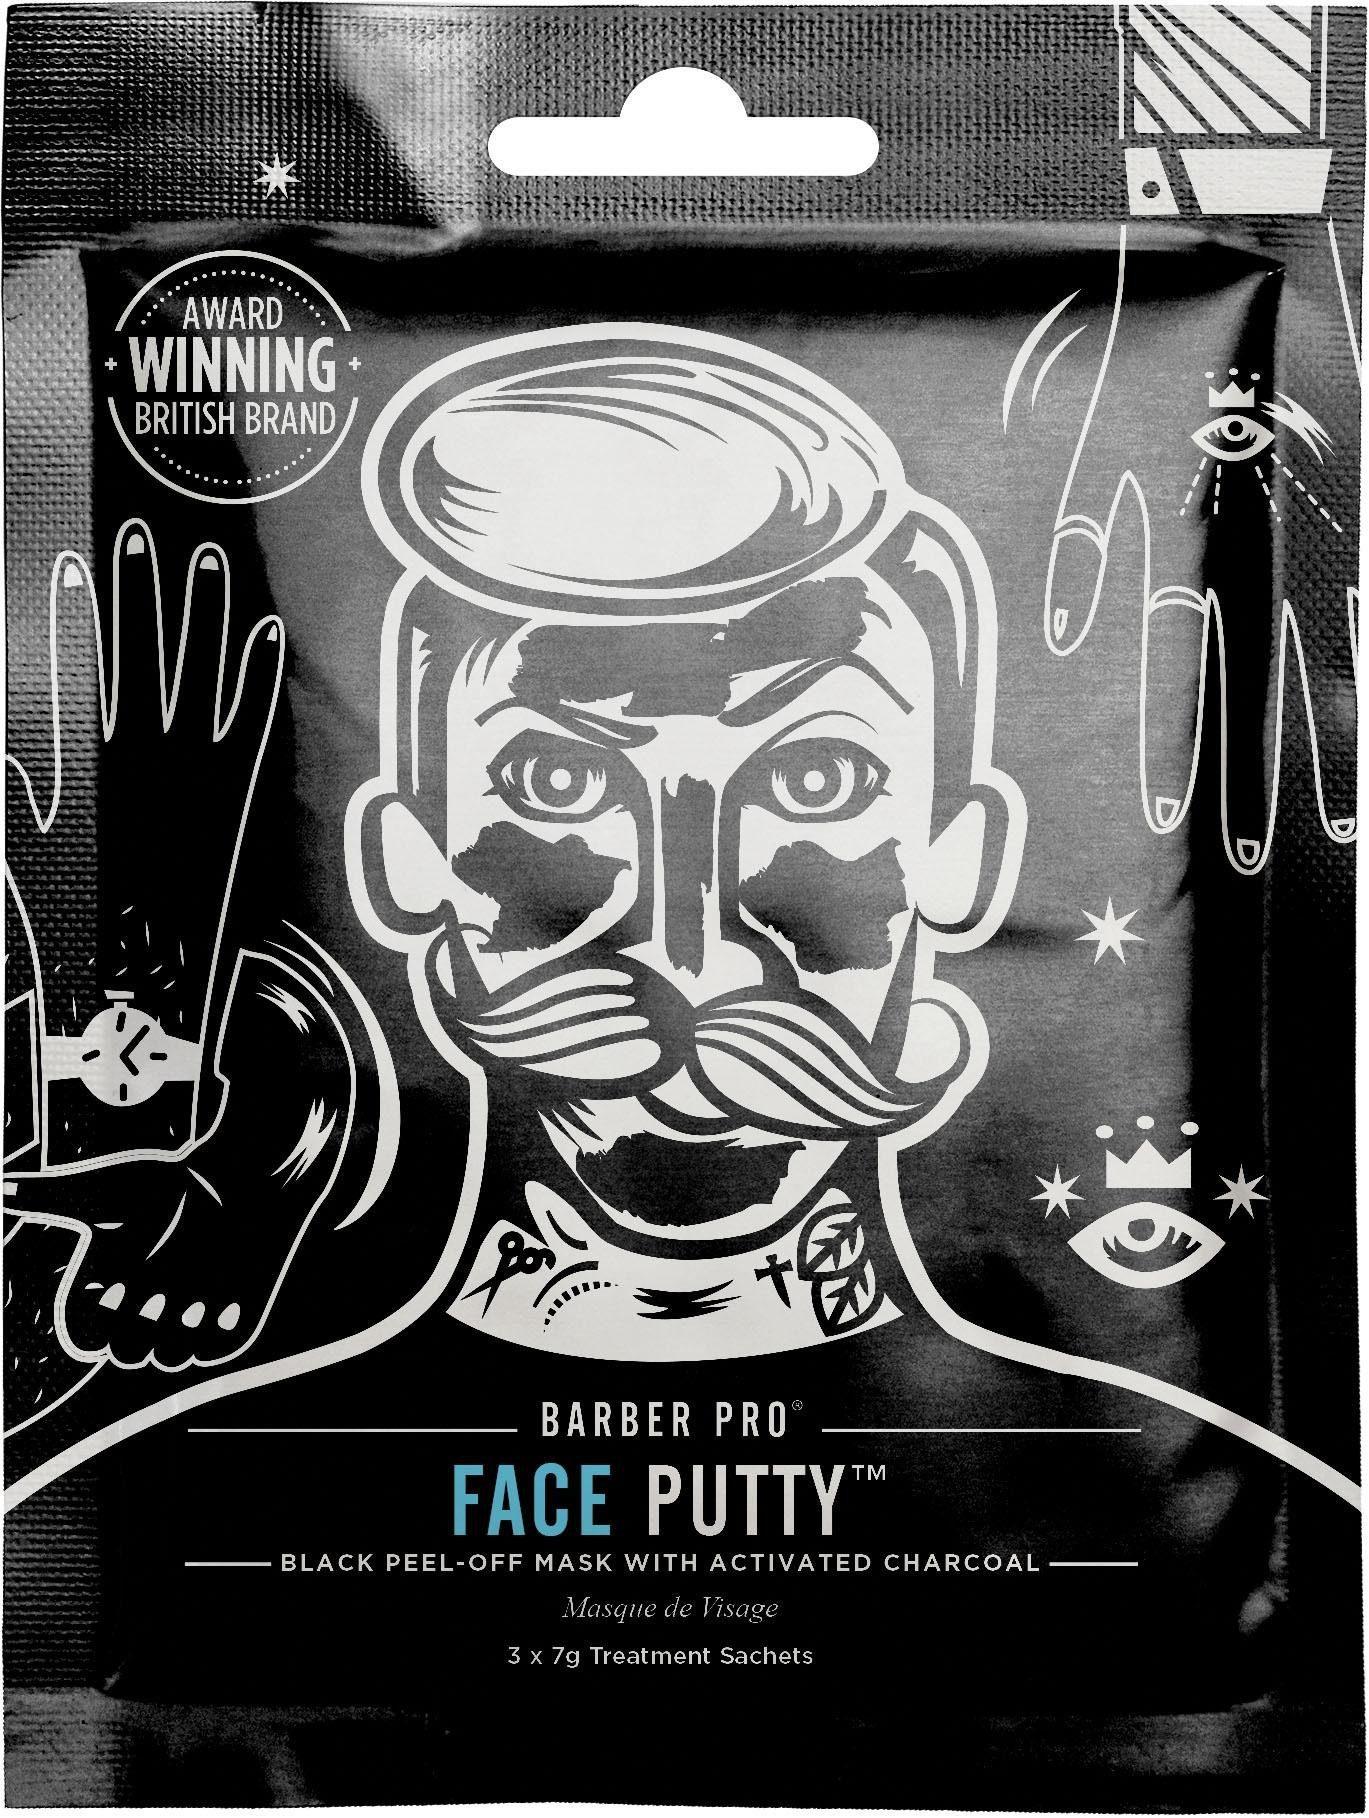 BARBER PRO, »Face Putty™«, Black Peel-Off Reinigungsmaske mit Tiefenwirkung (3-tlg. Set)